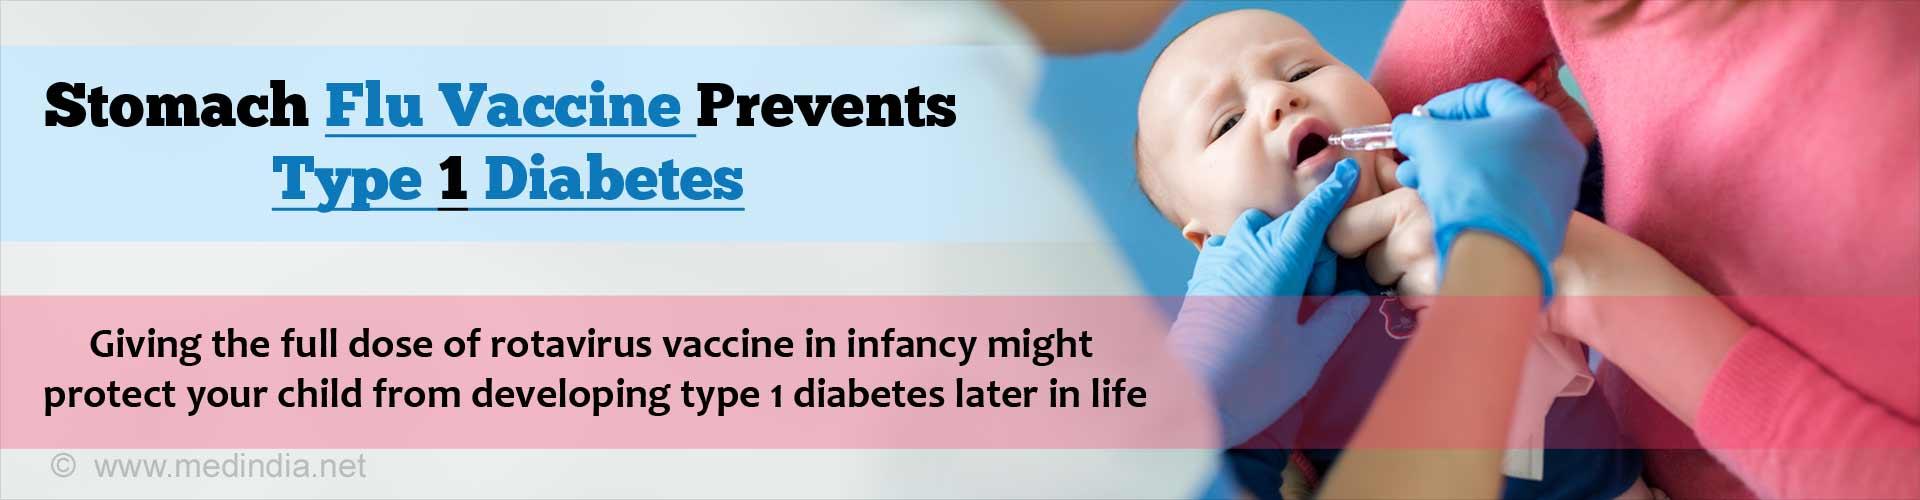 Rotavirus Vaccine May Protect Children Against Type 1 Diabetes